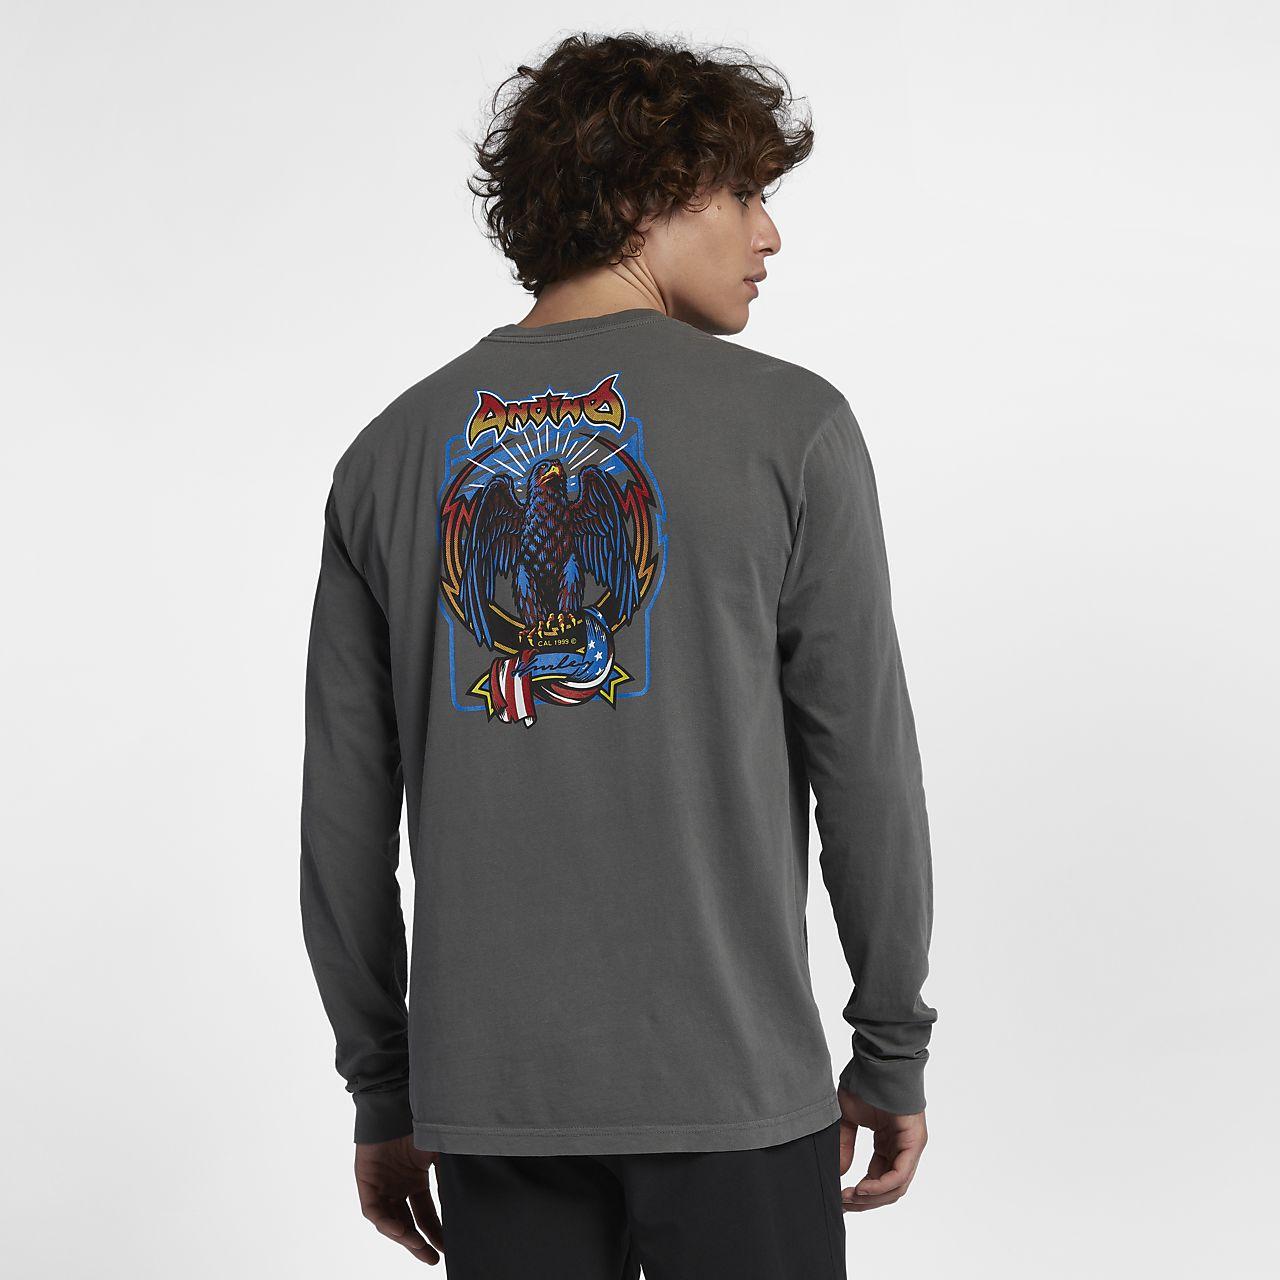 Hurley Team Andino Men's Long-Sleeve T-Shirt